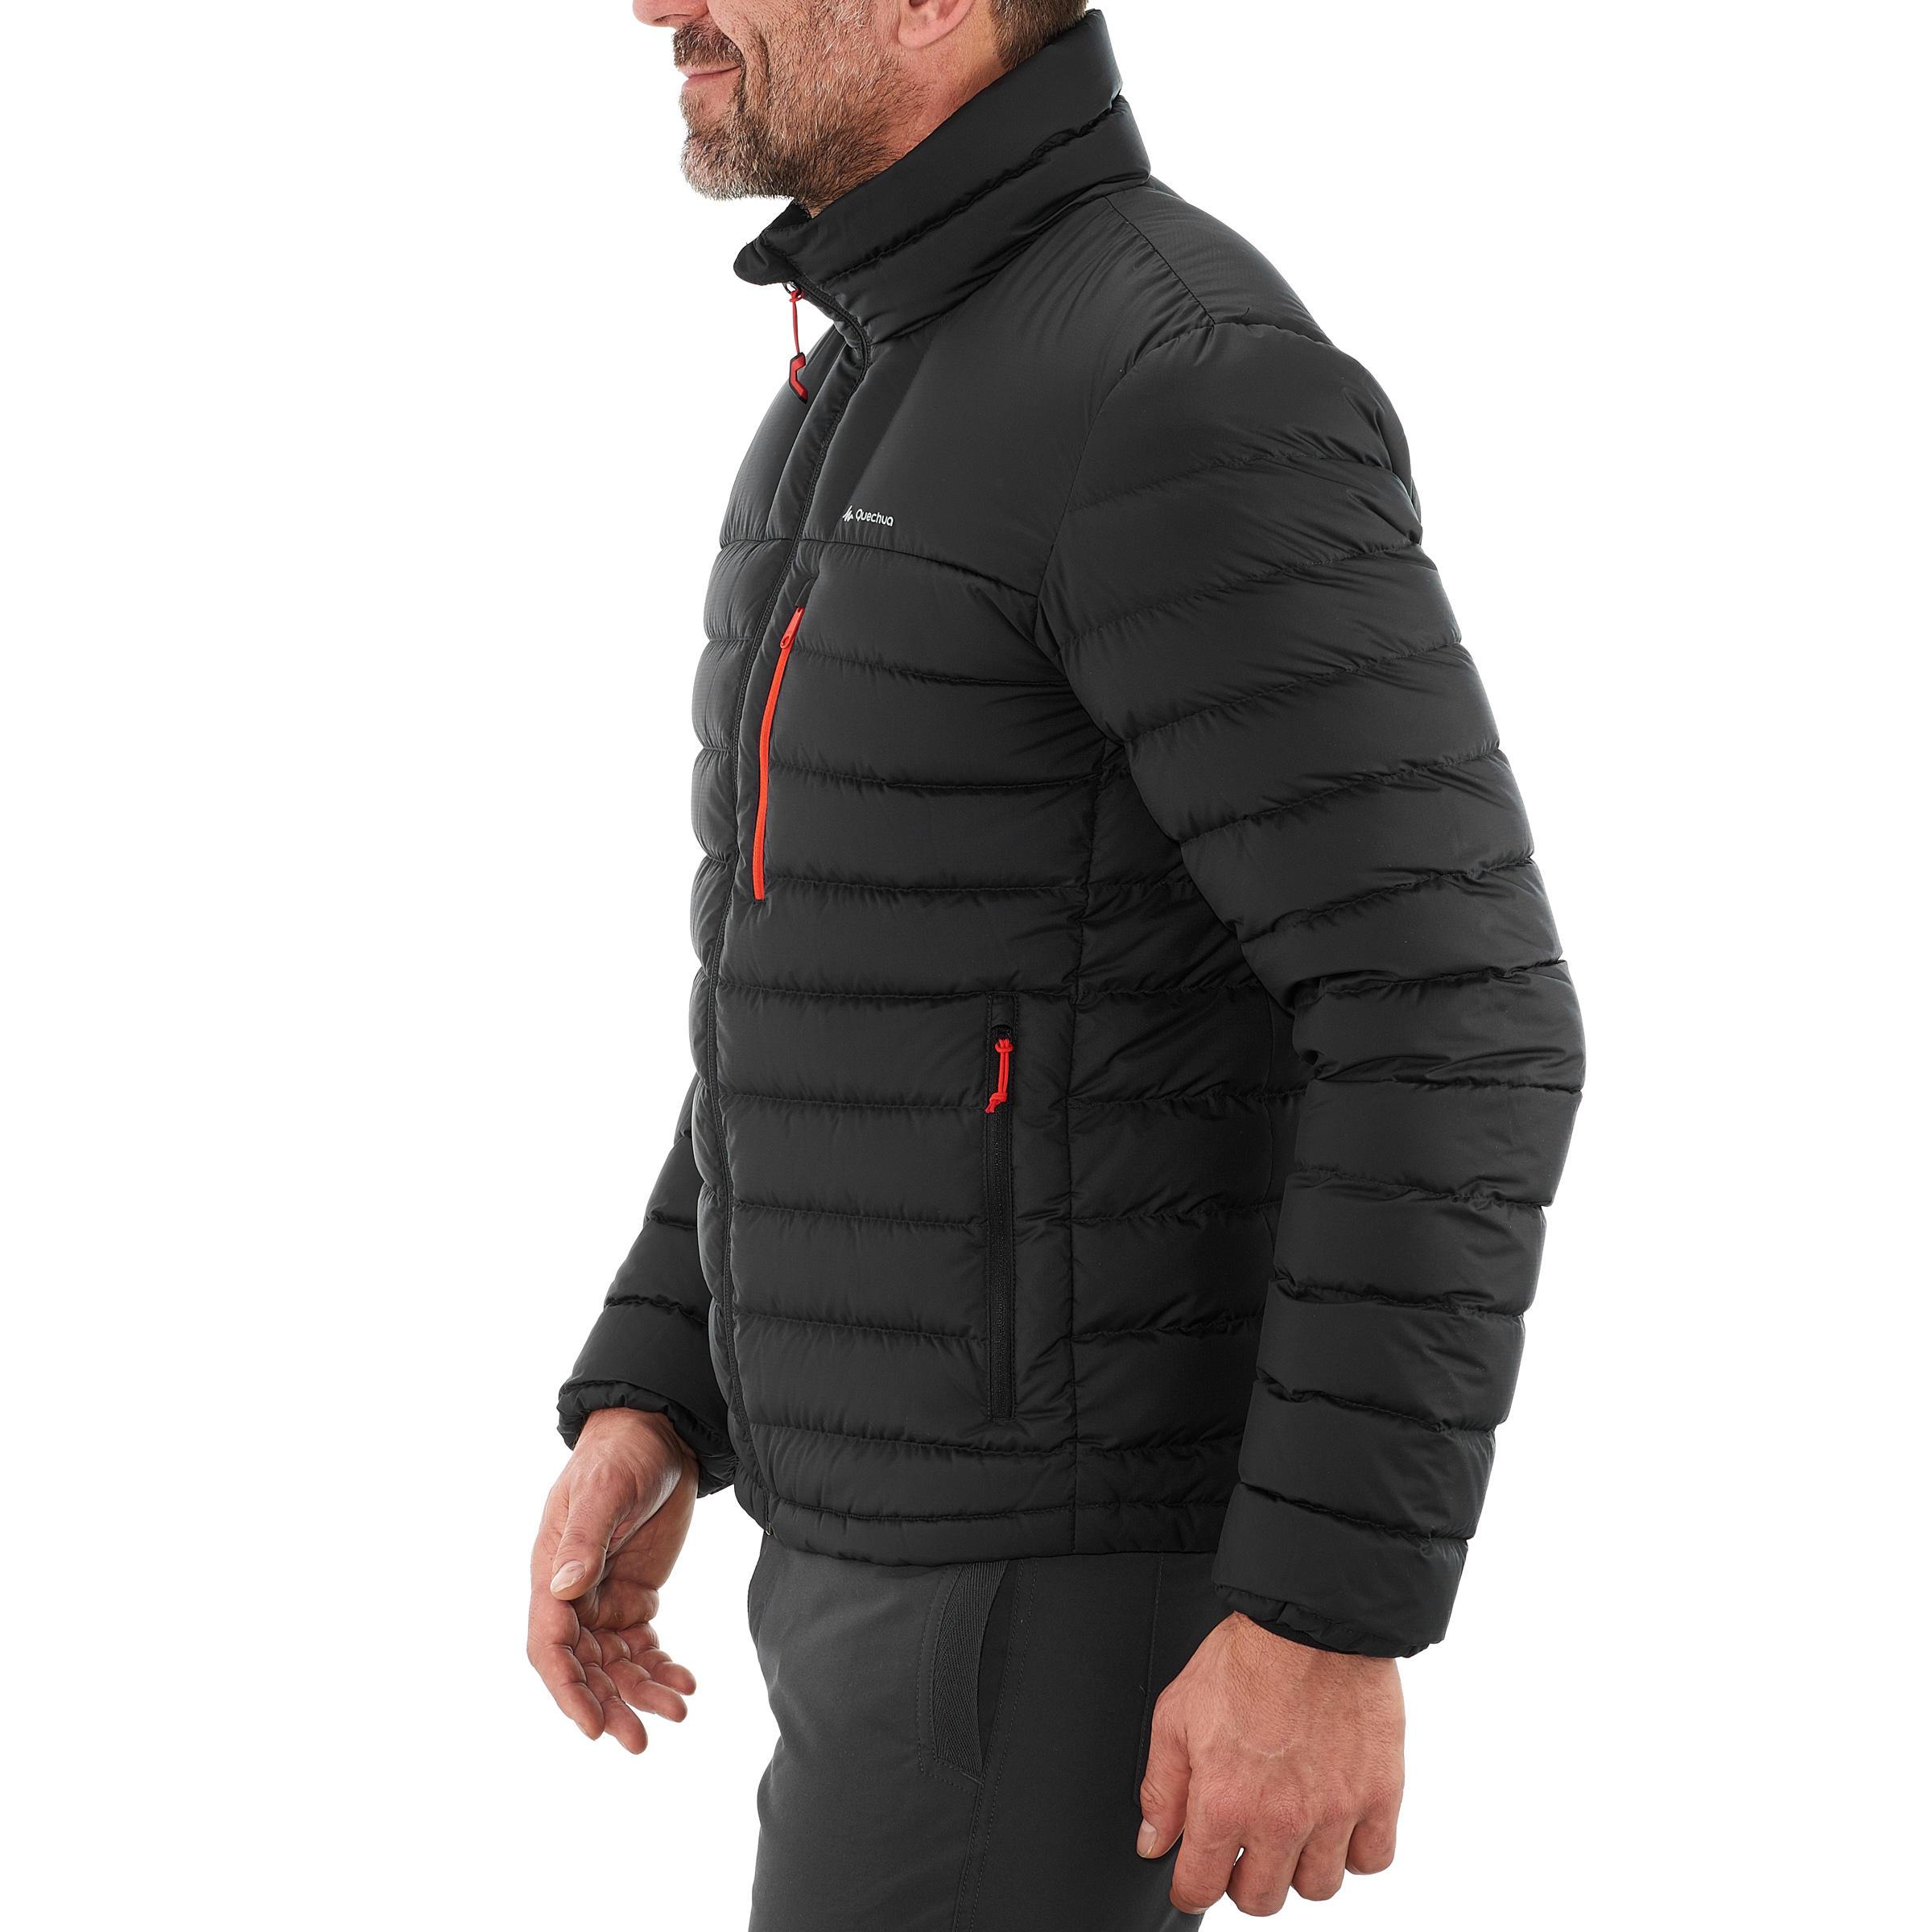 Trek900 Men's Mountain Trekking Down Jacket - Black